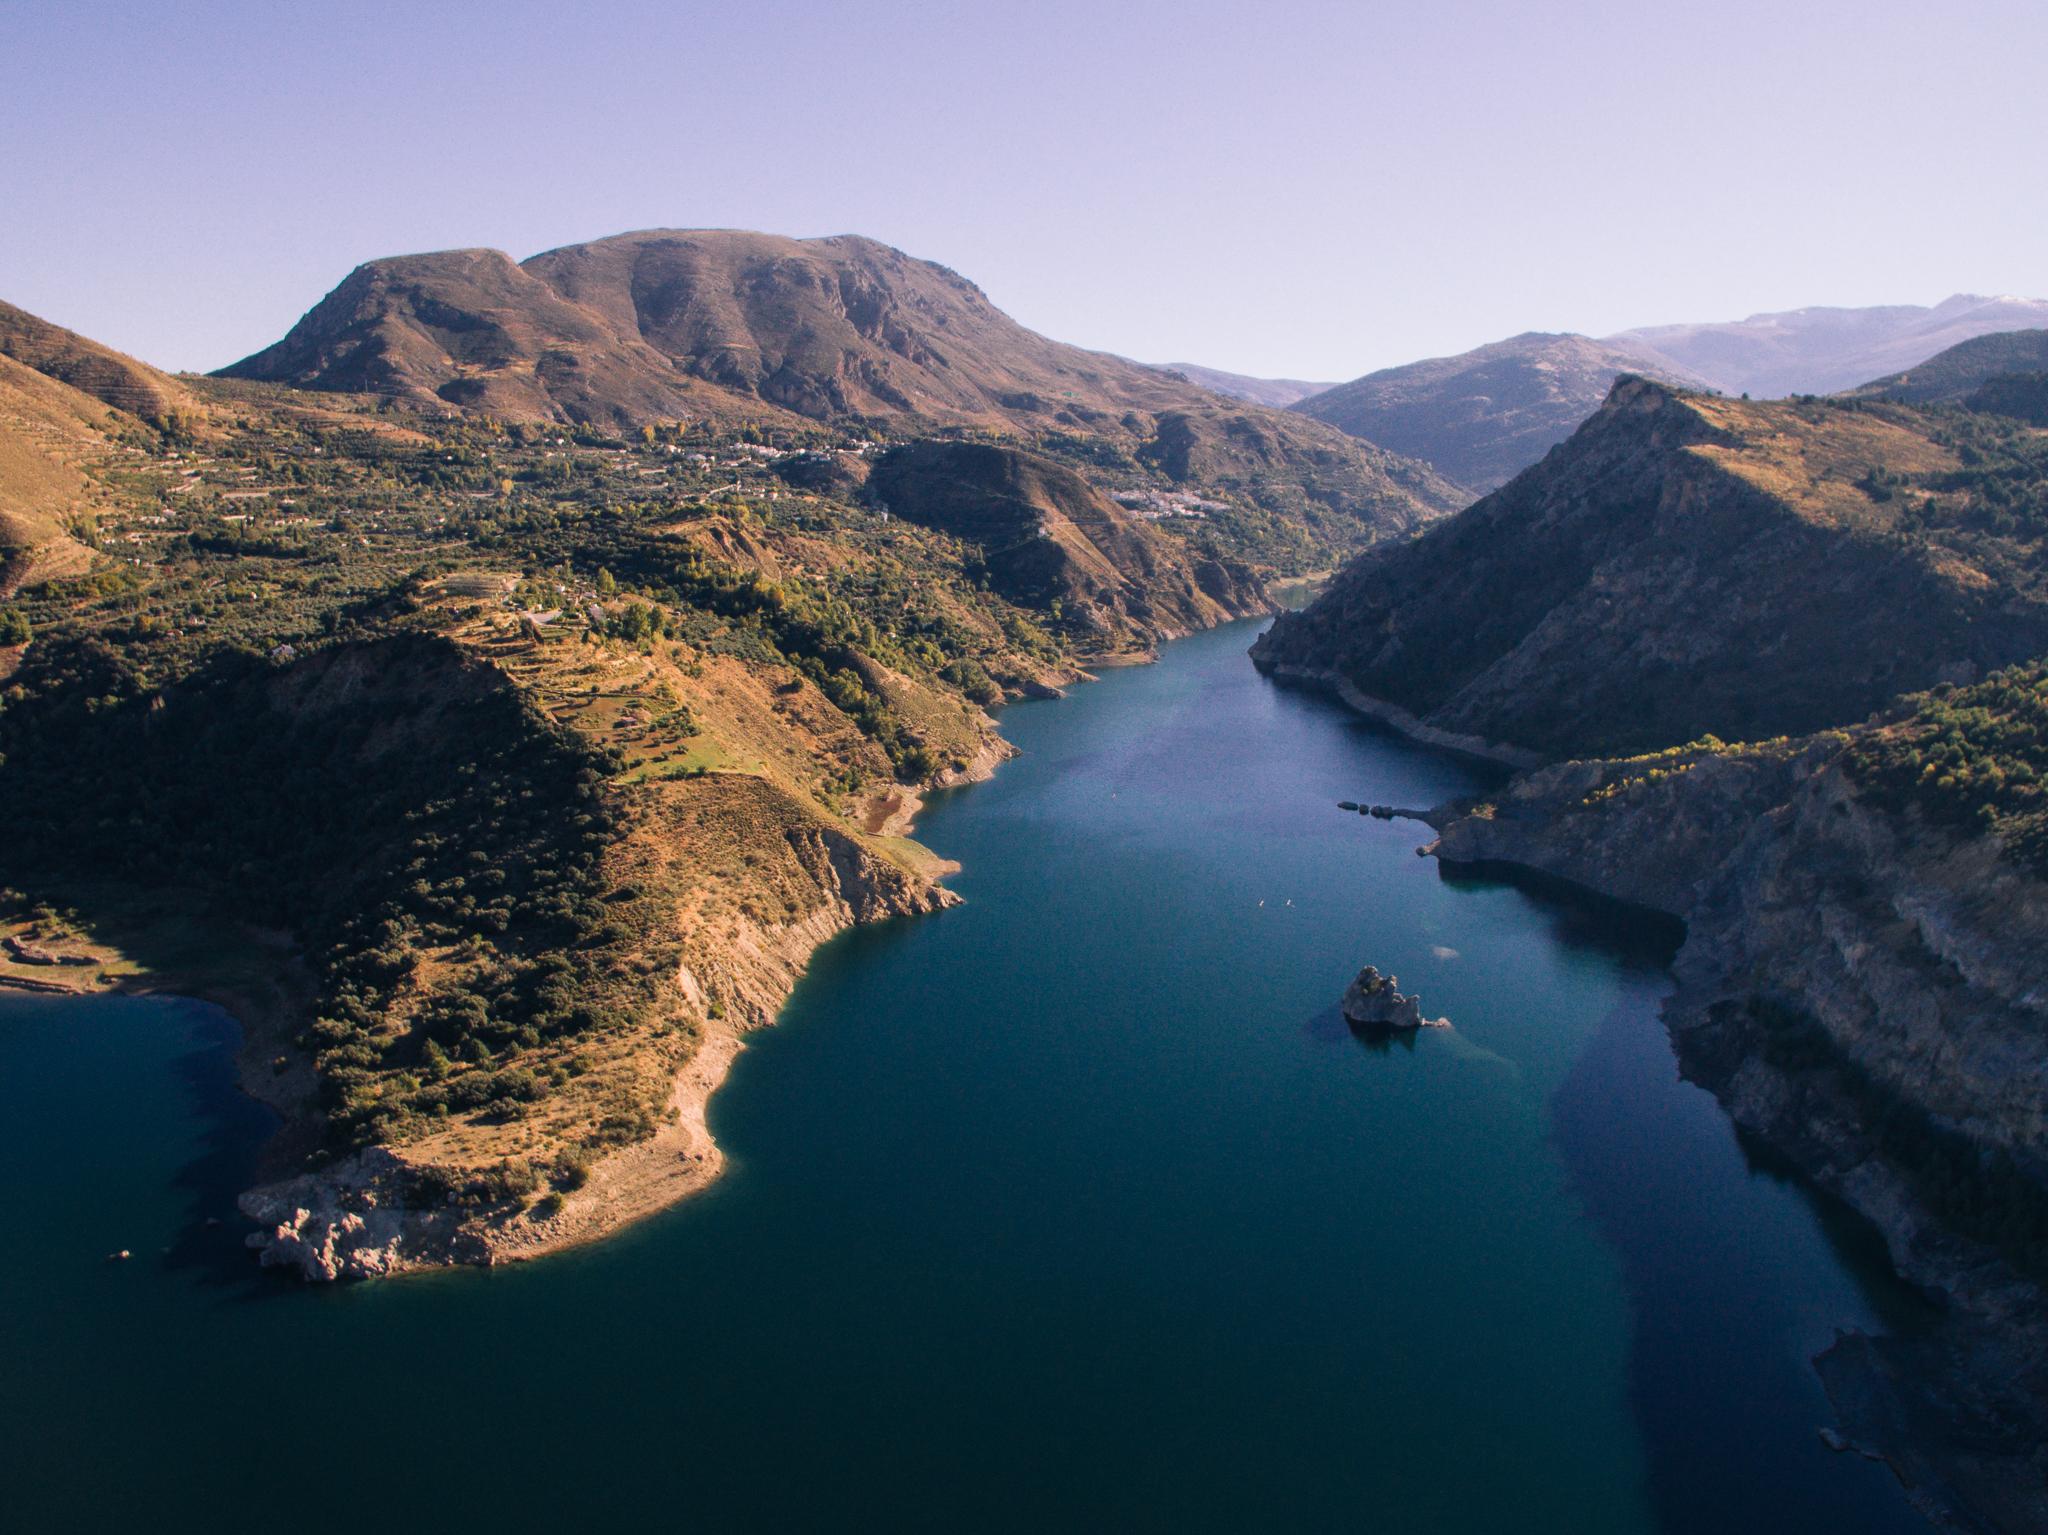 There is still plenty of exploring to do near Güéjar Sierra